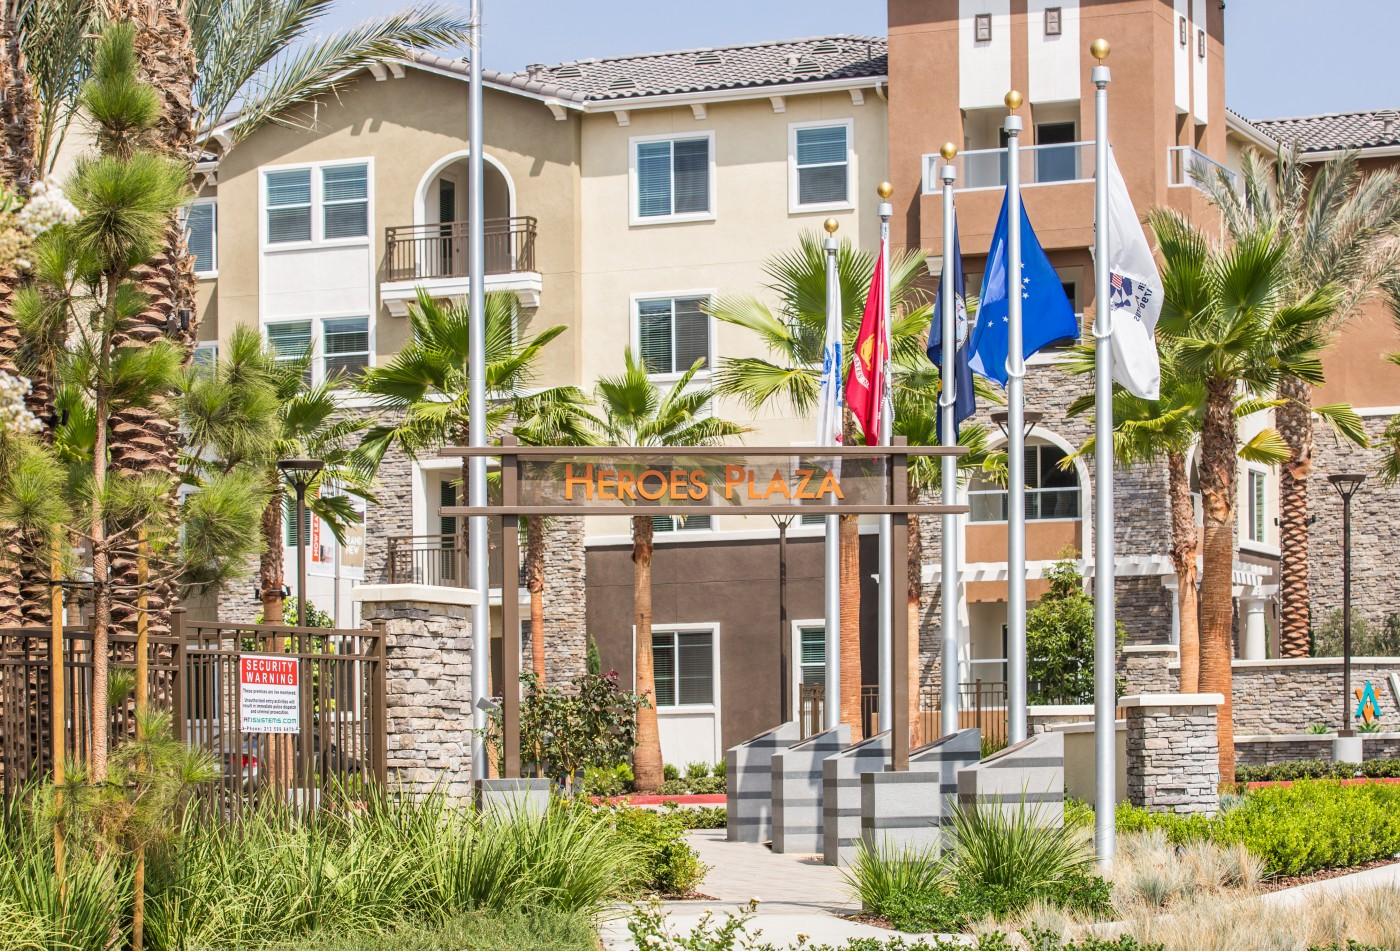 Building at Valentia Apartment Homes in La Habra, CA